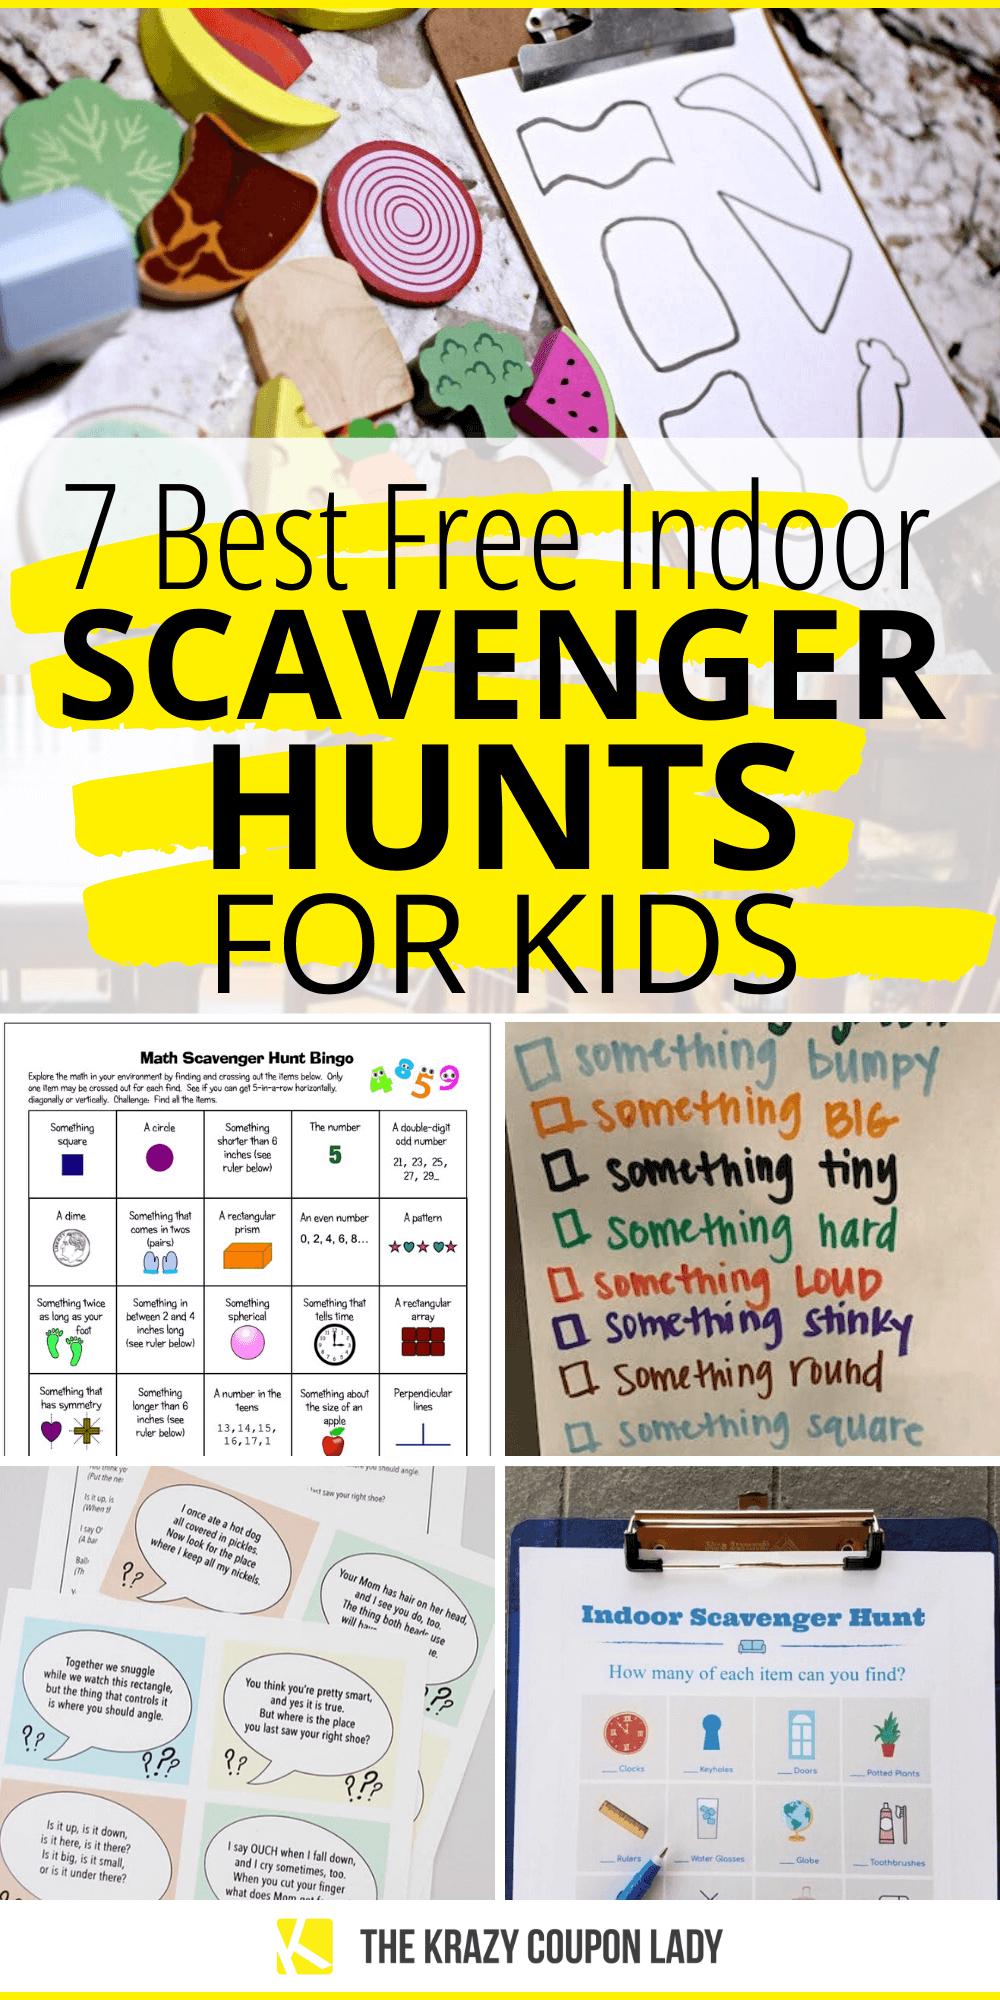 7 Best Free Indoor Scavenger Hunt Ideas For Kids In 2020 Family Math Night Scavenger Hunt Activities For Kids